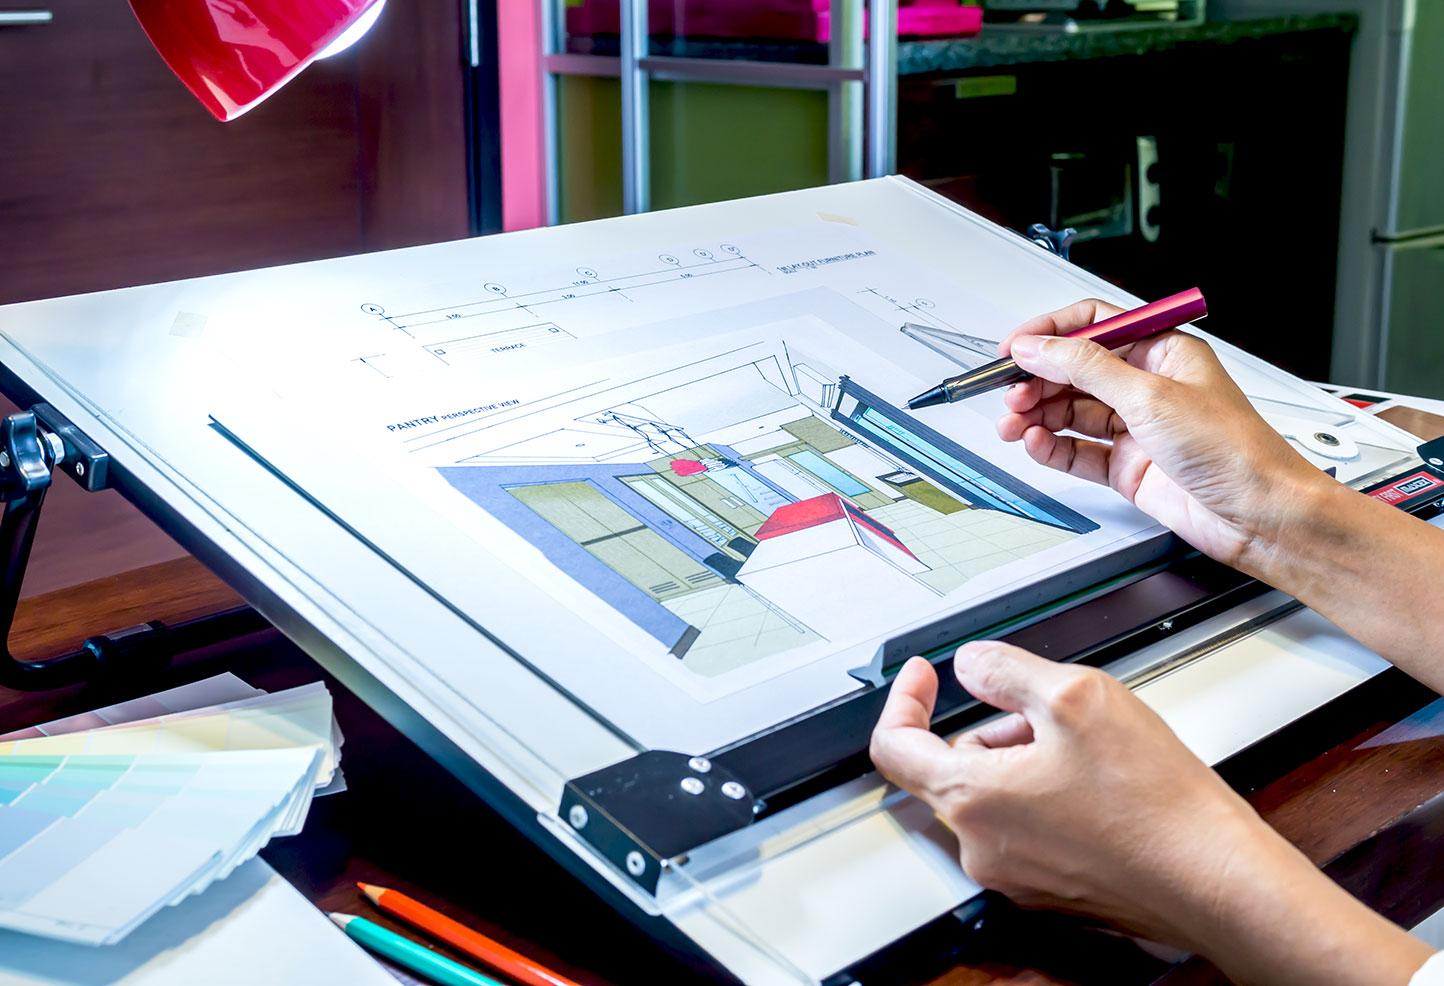 National council for interior design qualification ncidq - Interior decorator qualifications ...